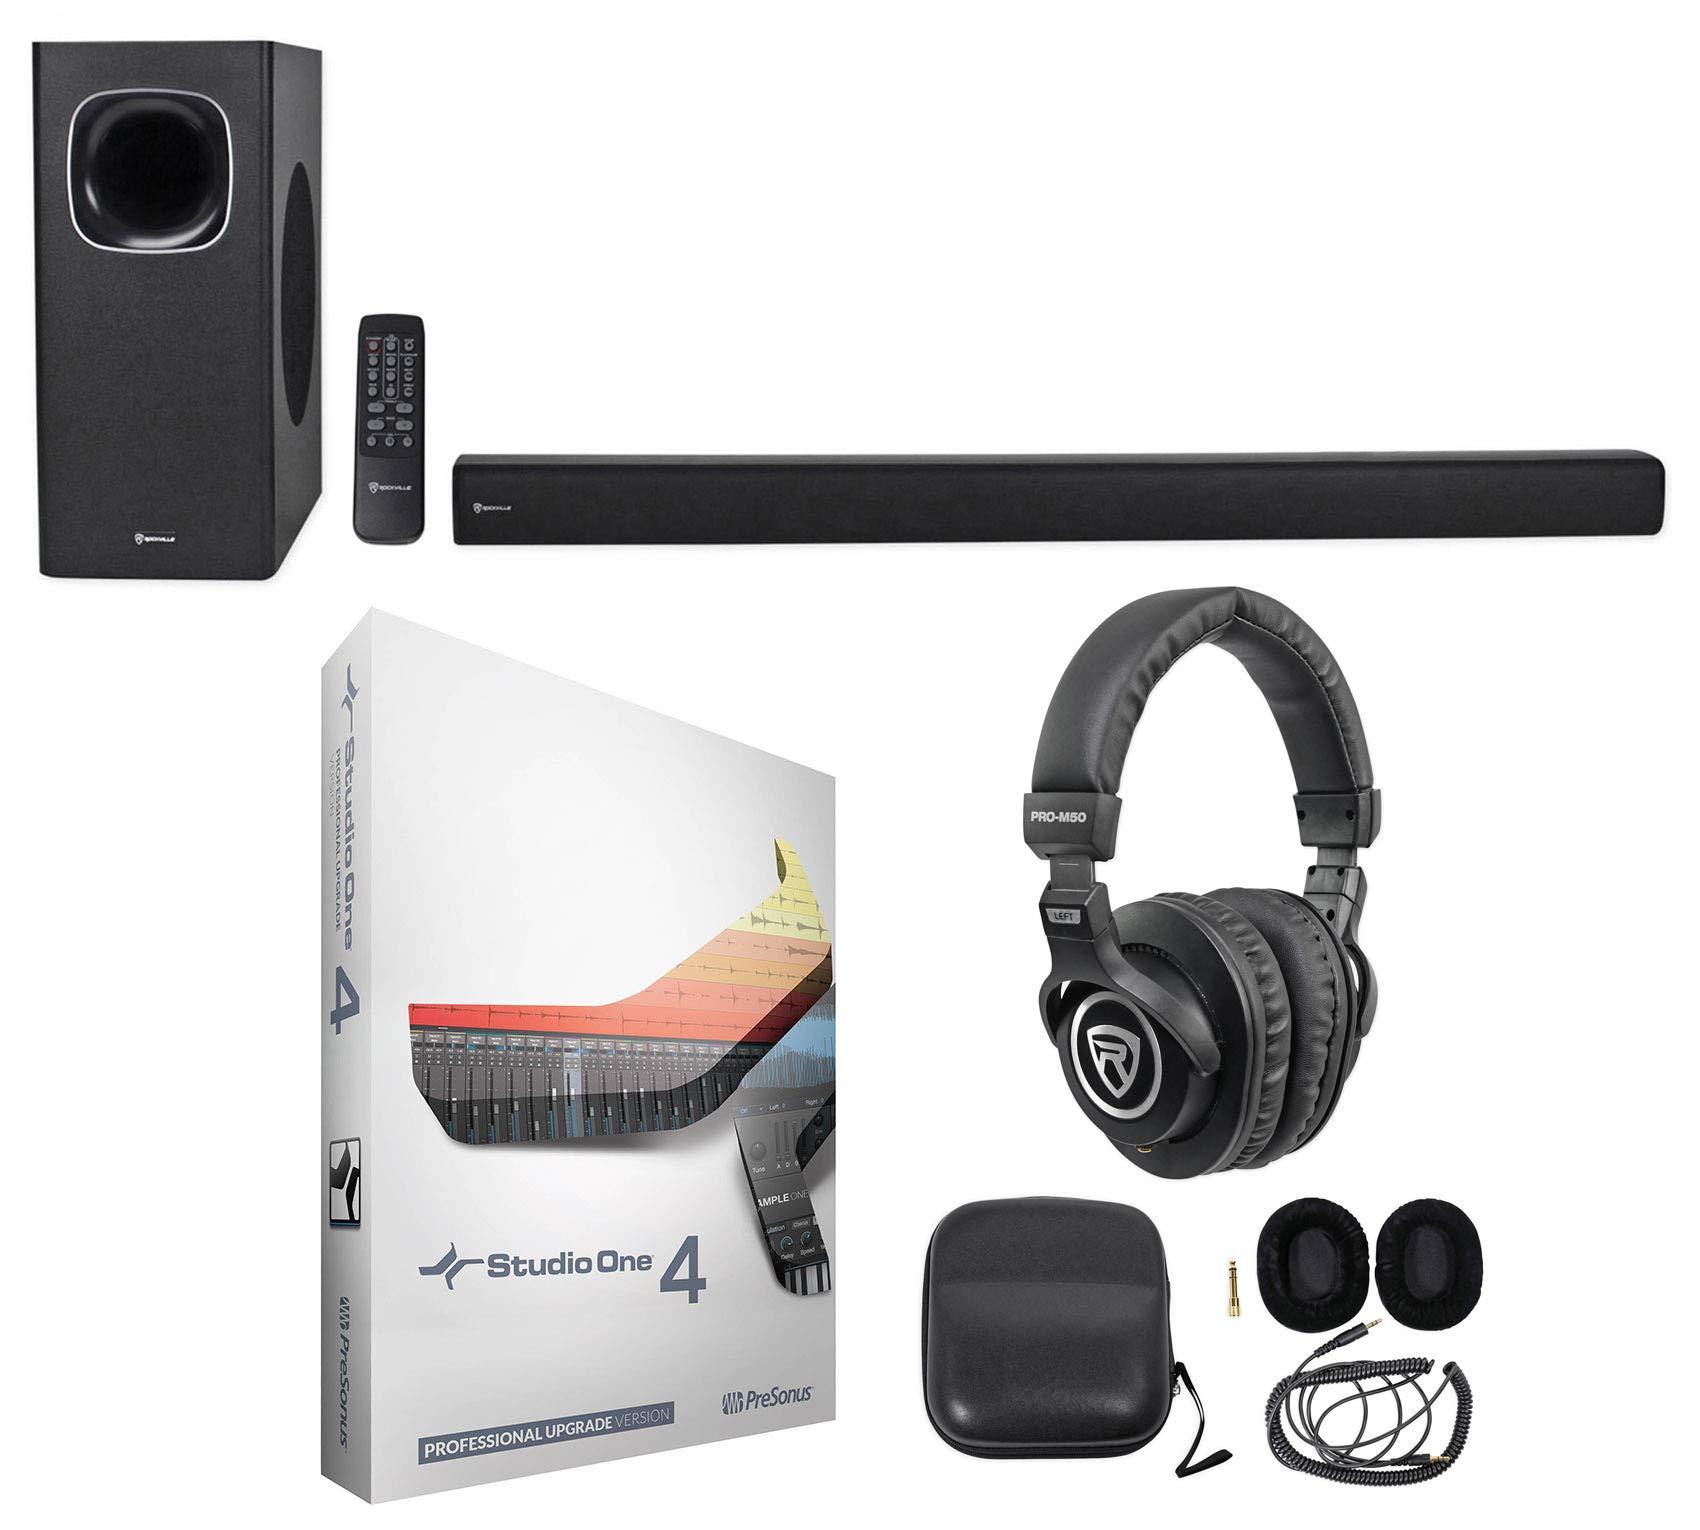 Presonus Studio One 4 Pro Upgrade from Artist/Producer+Soundbar+Headphones